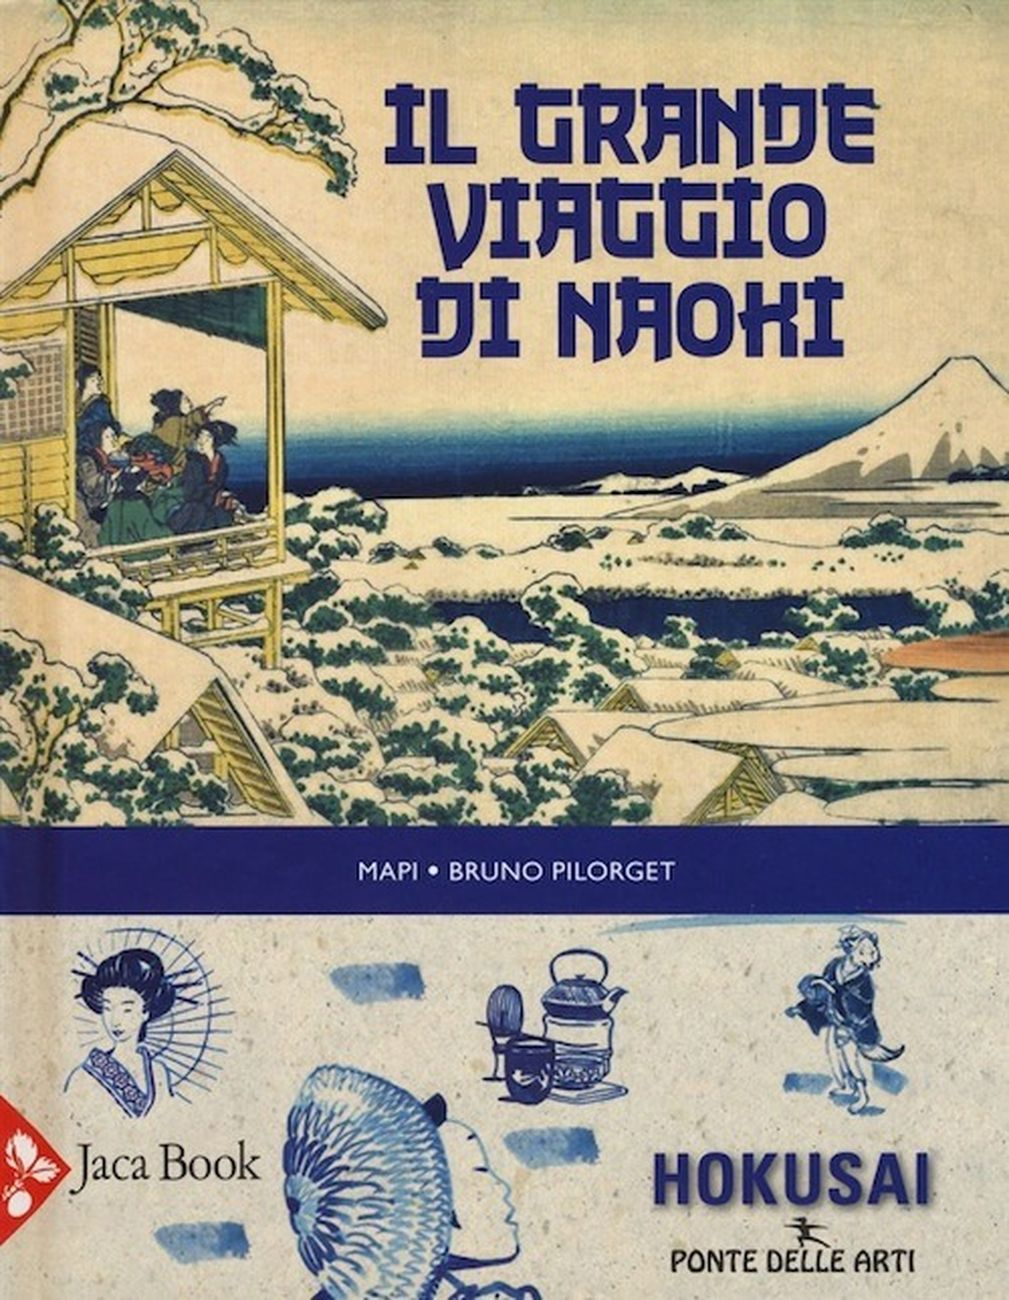 Mariapaola Pesce aka Mapi & Bruno Pilorget – Il grande viaggio di Naoki (Jaca Book, Milano 2019). Copertina